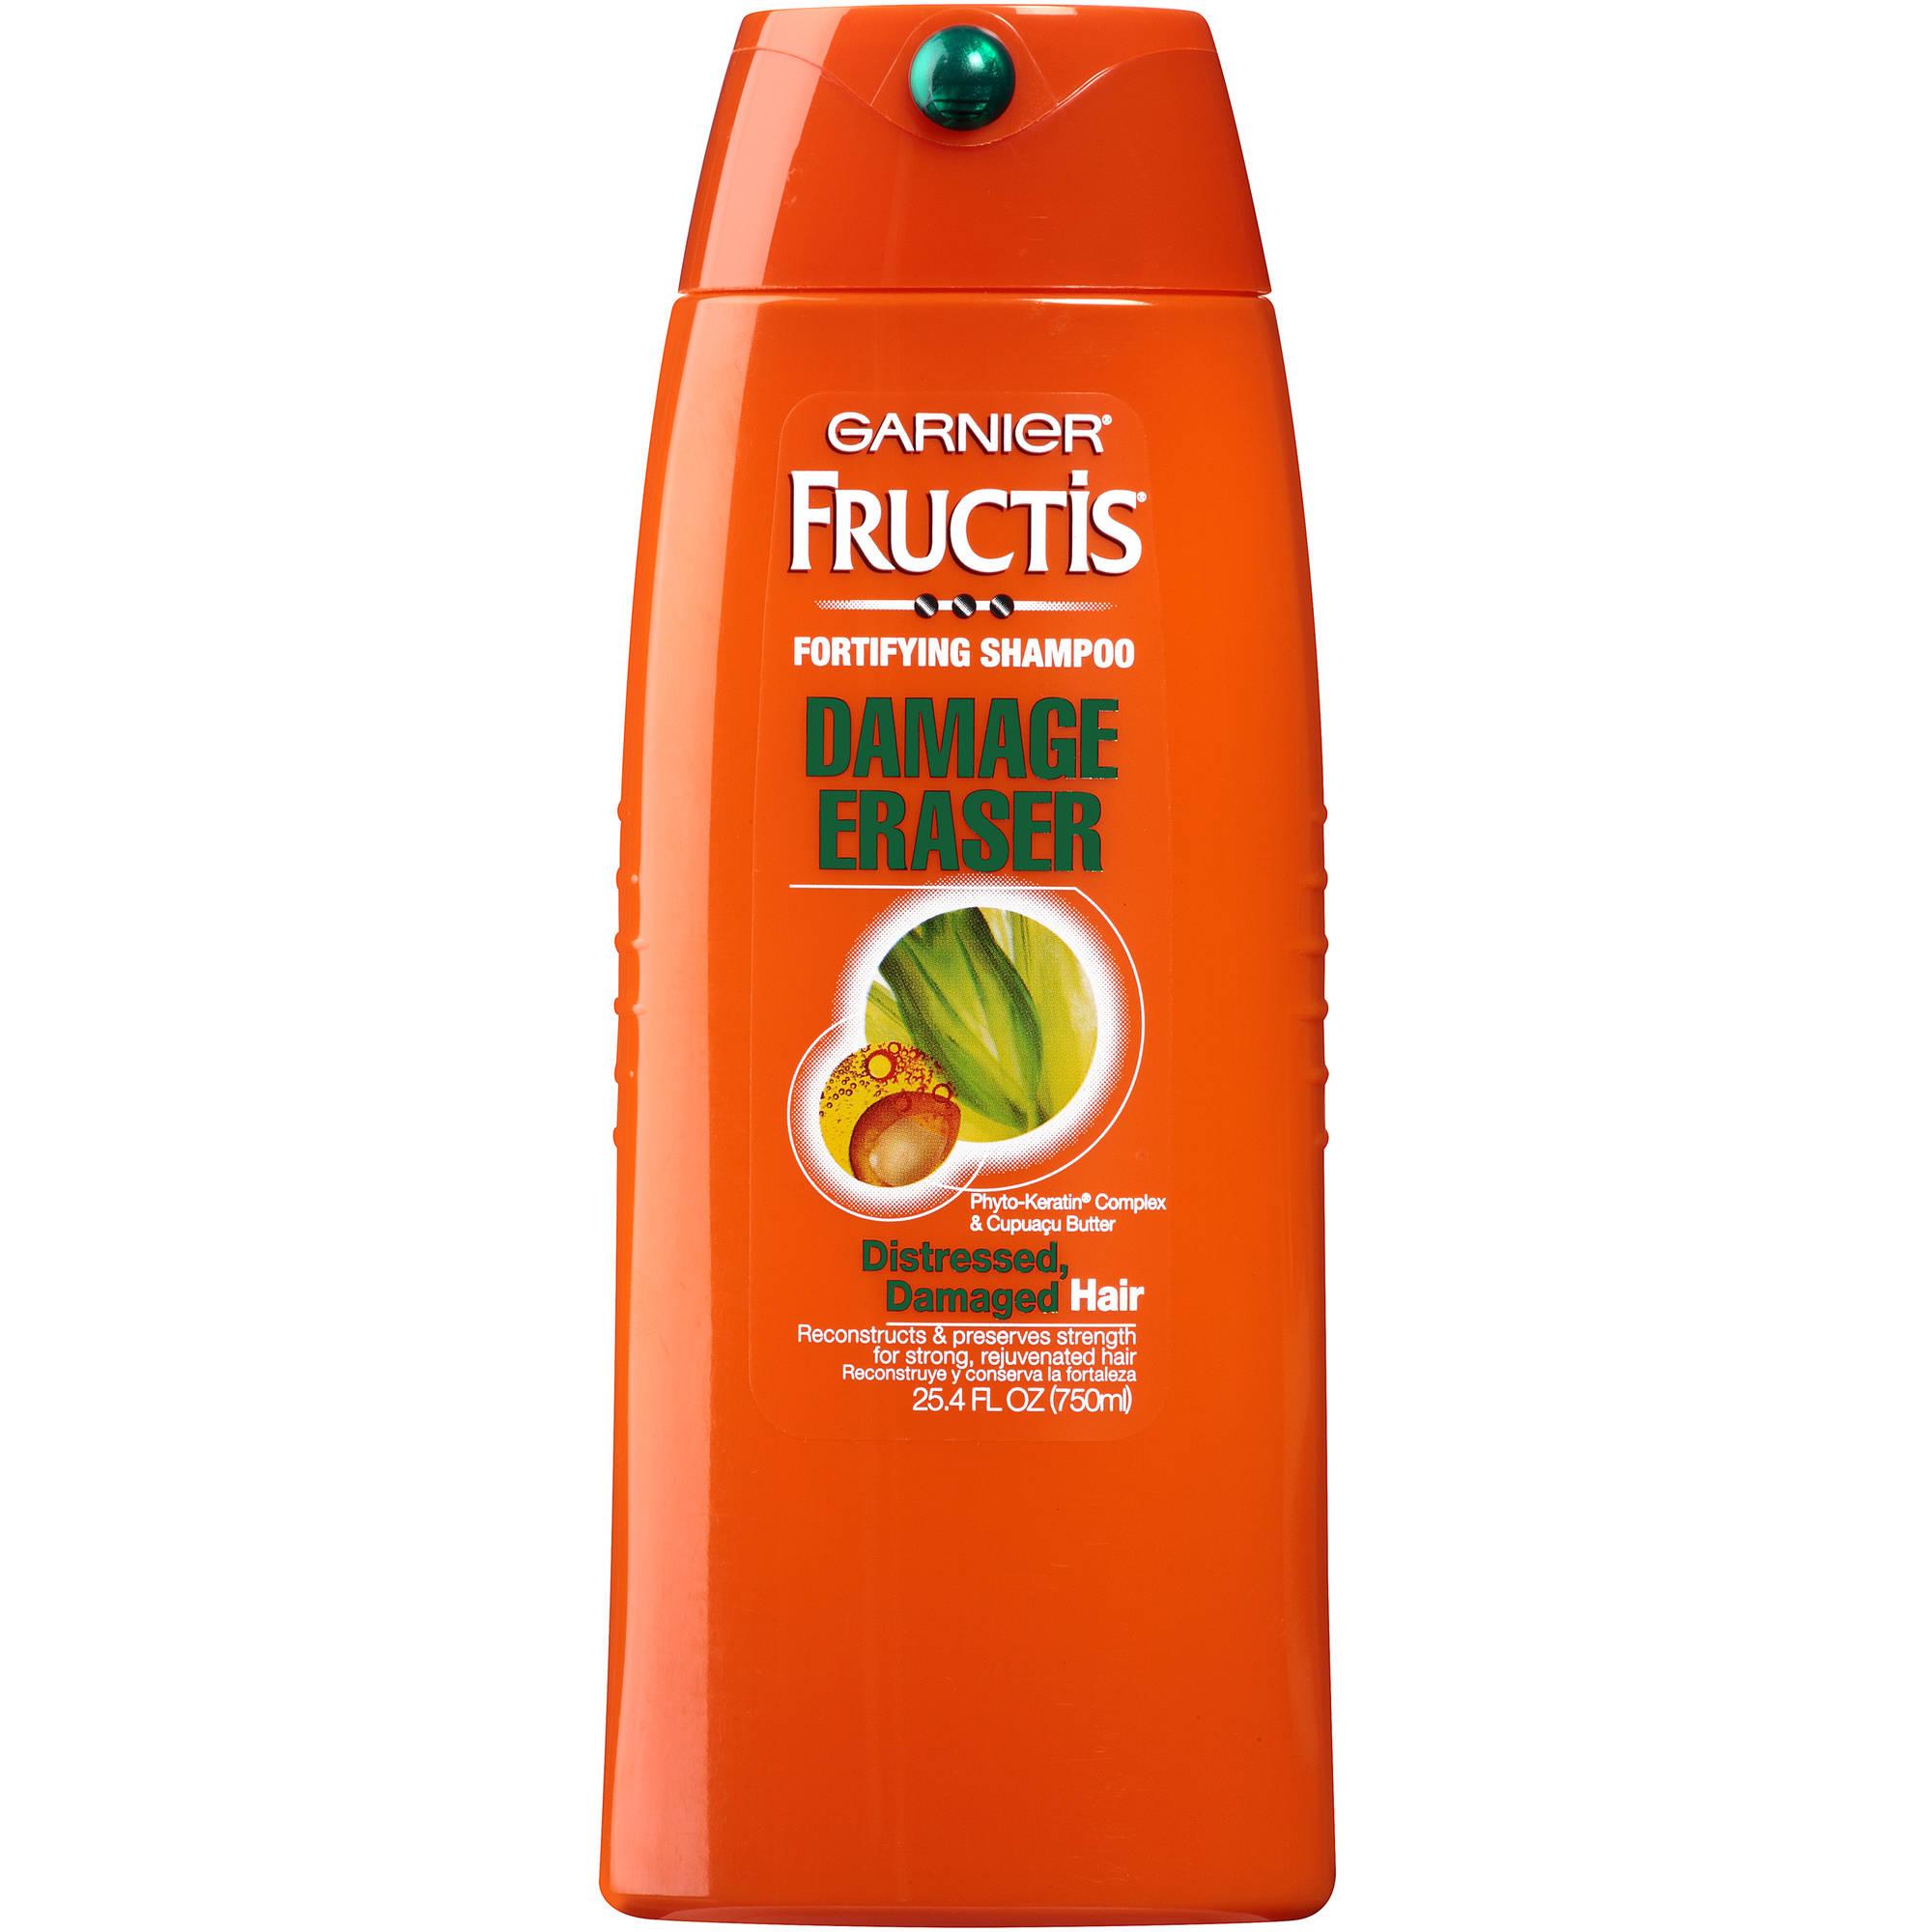 Garnier Fructis Damage Eraser Fortifying Shampoo, 25.4 fl oz